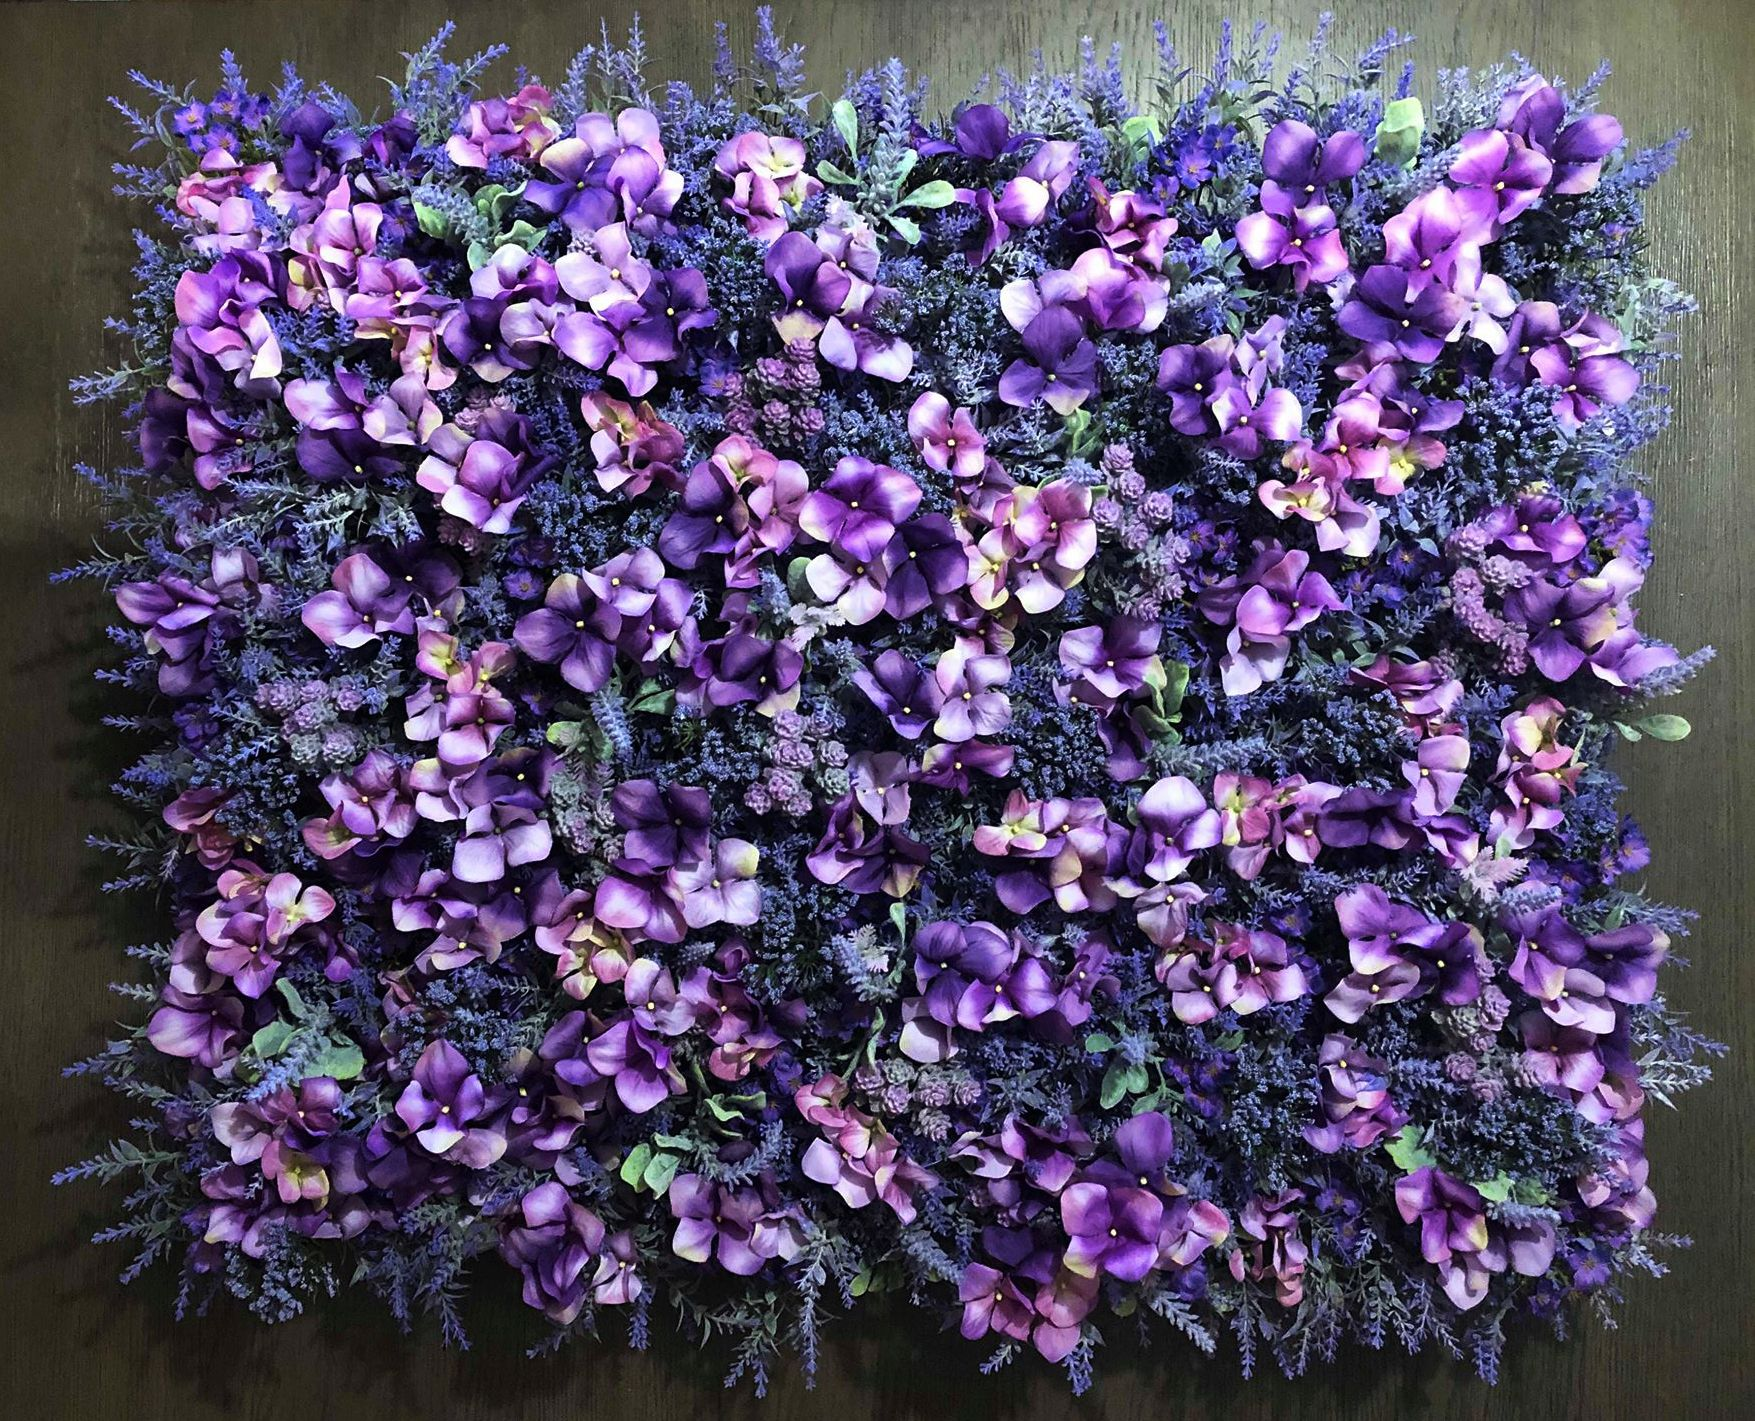 Lavish Lavender Flower Wall Flower Wall Backdrop Lavender Walls